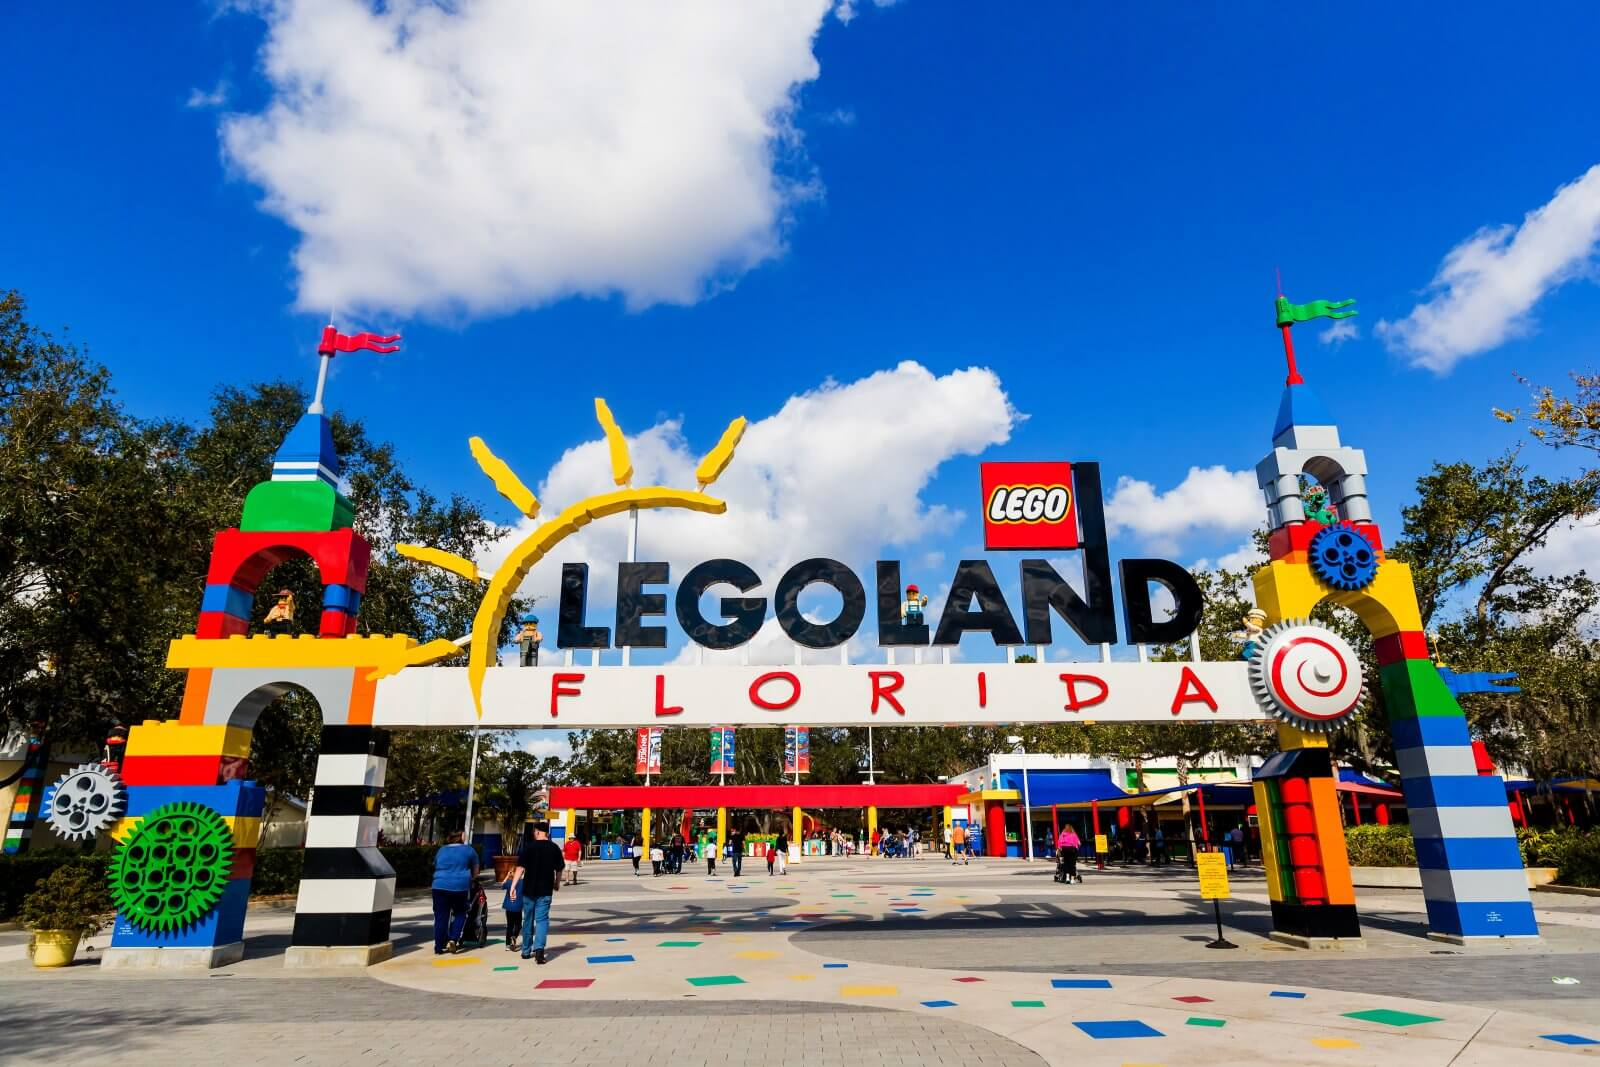 Legoland Florida | Central Florida Development Council